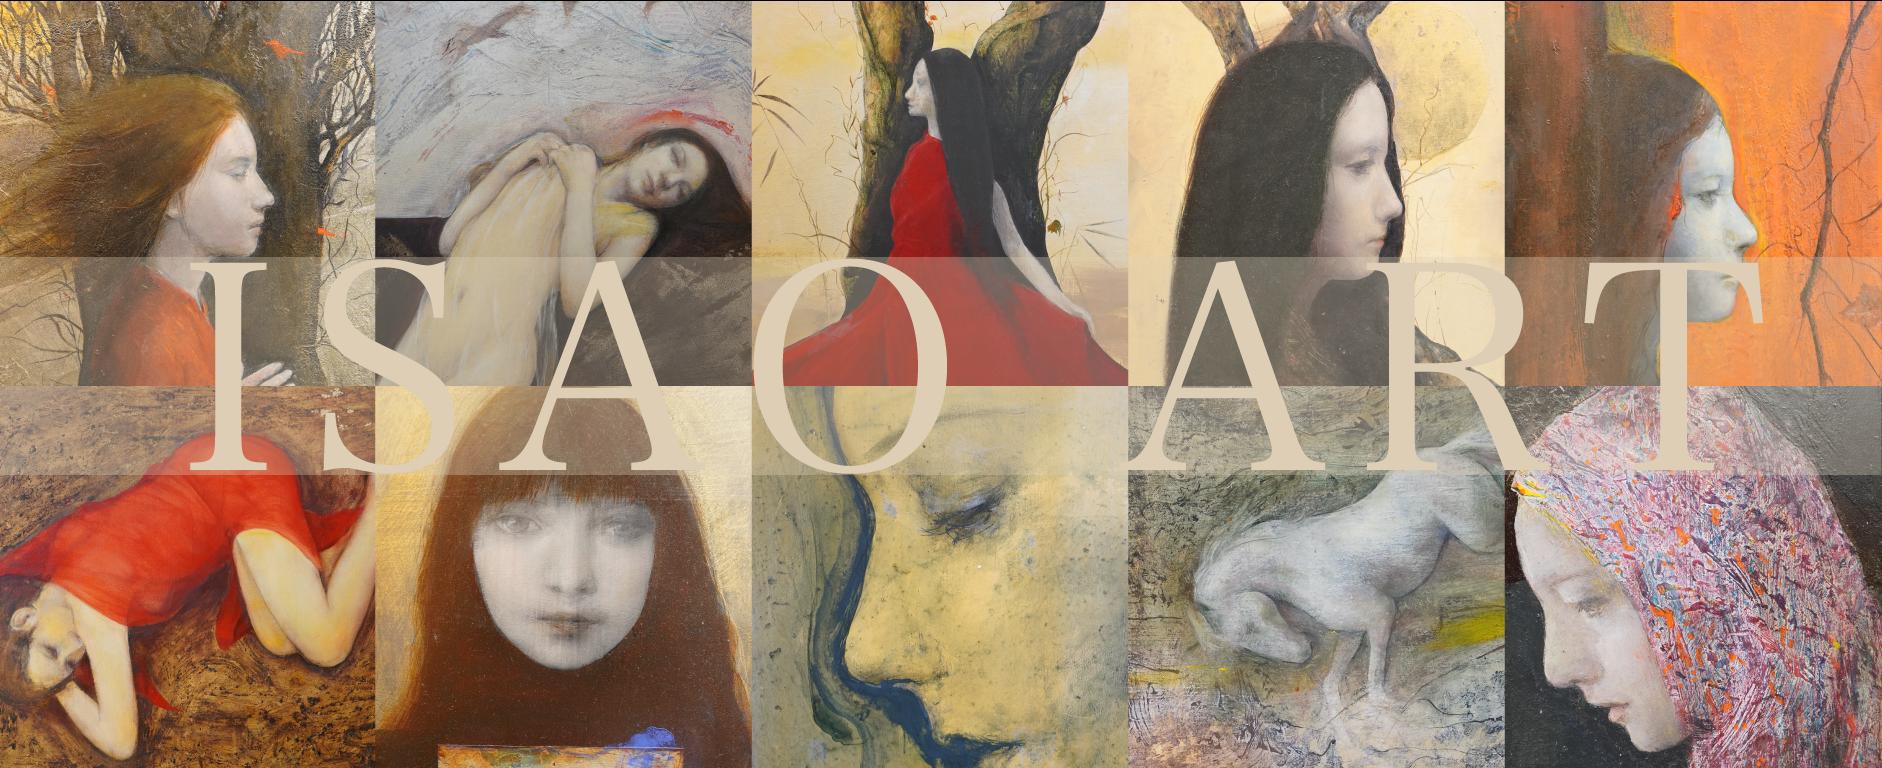 【ISAO ART vol.01】作品10点を公開。